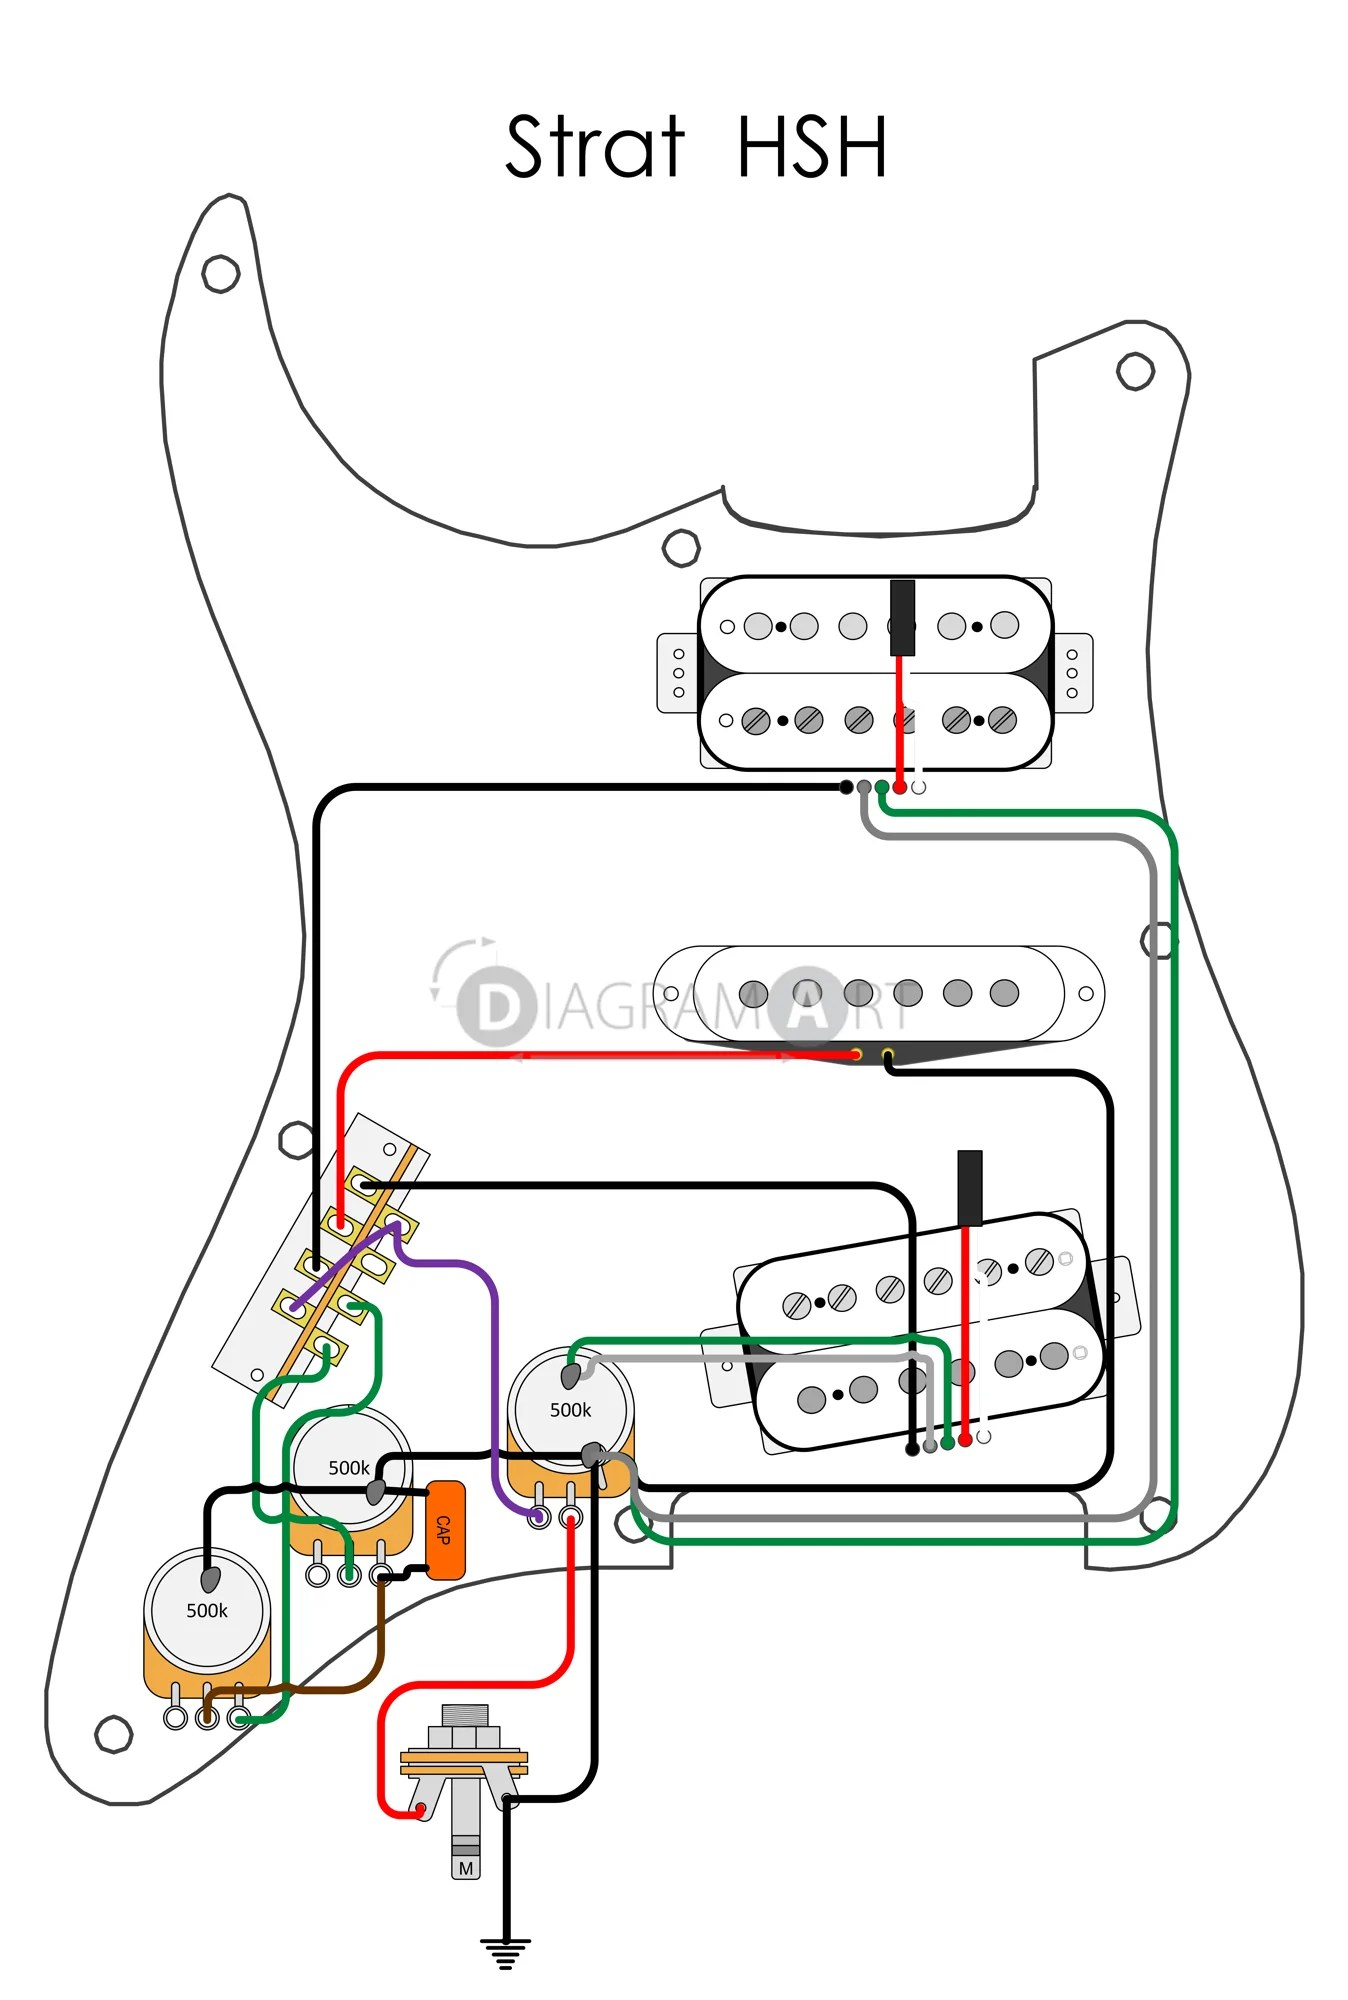 free download guitar wiring diagrams diagram jem simple wiring schema car air horn wiring diagram guitar wiring diagram hsh [ 1348 x 2000 Pixel ]